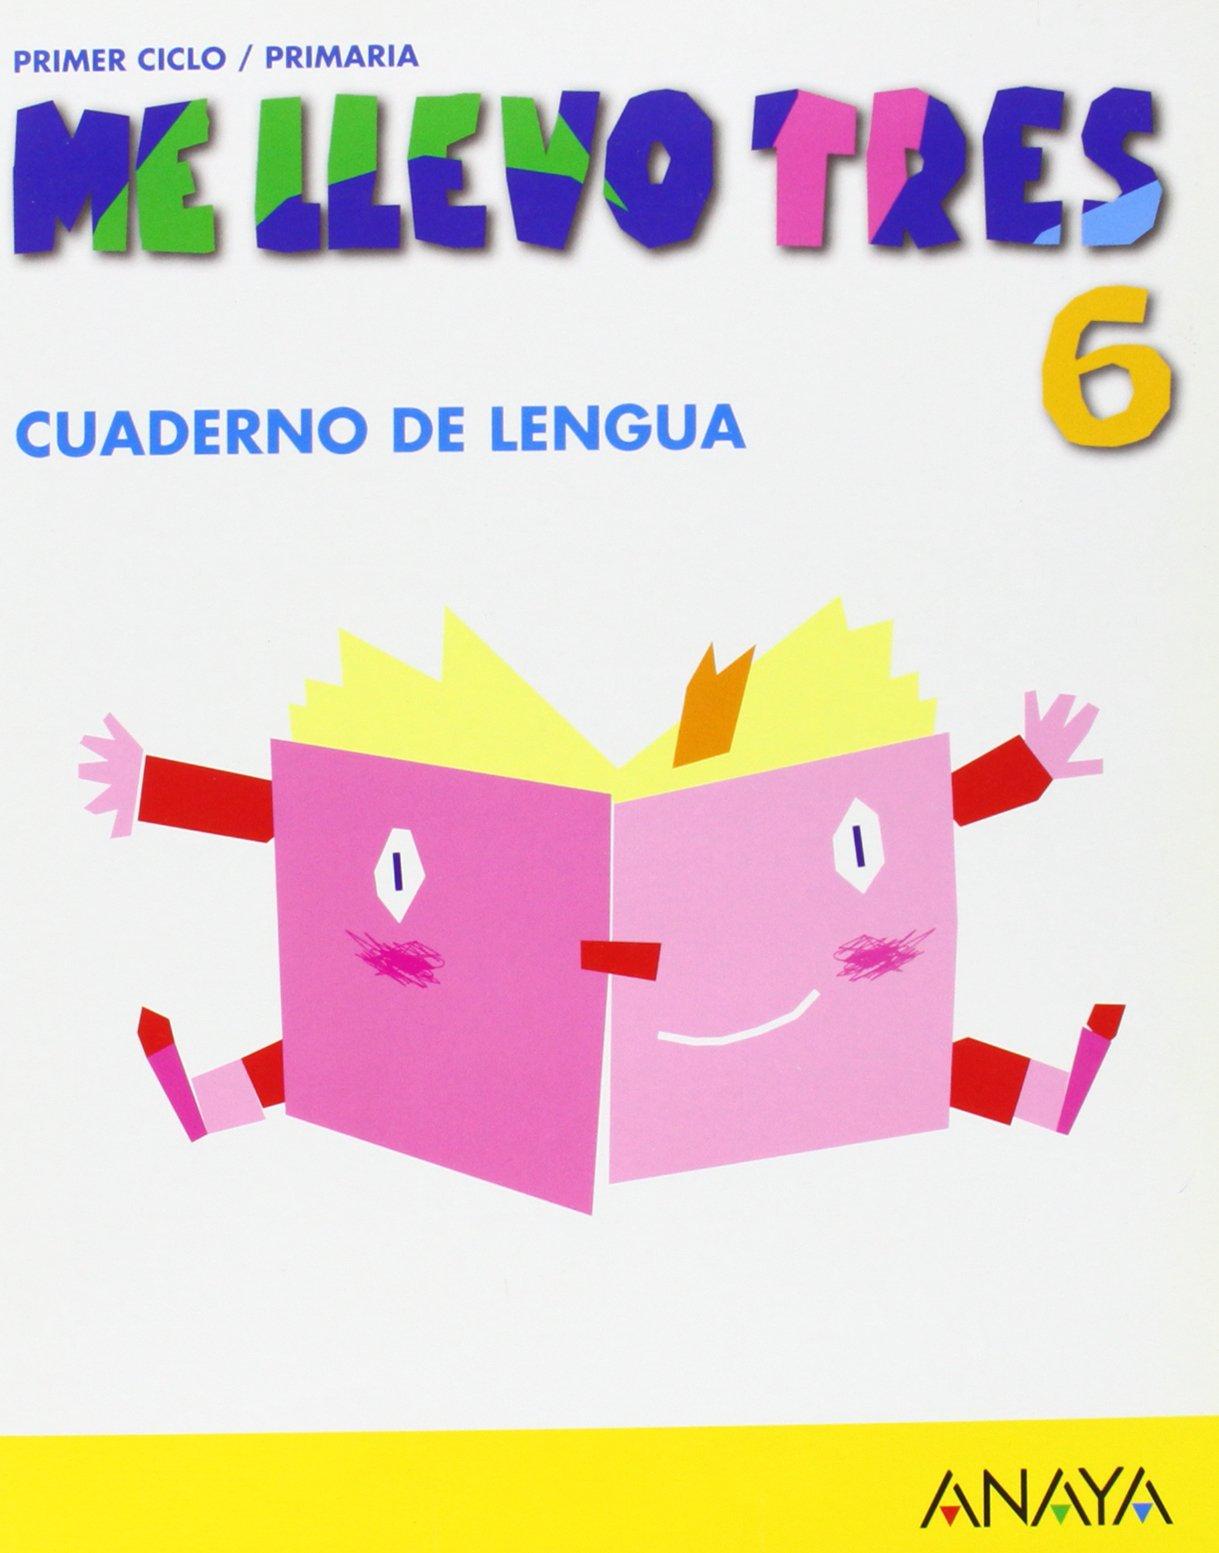 Cuaderno de Lengua 6 (Spanish) Paperback – July 2, 2007